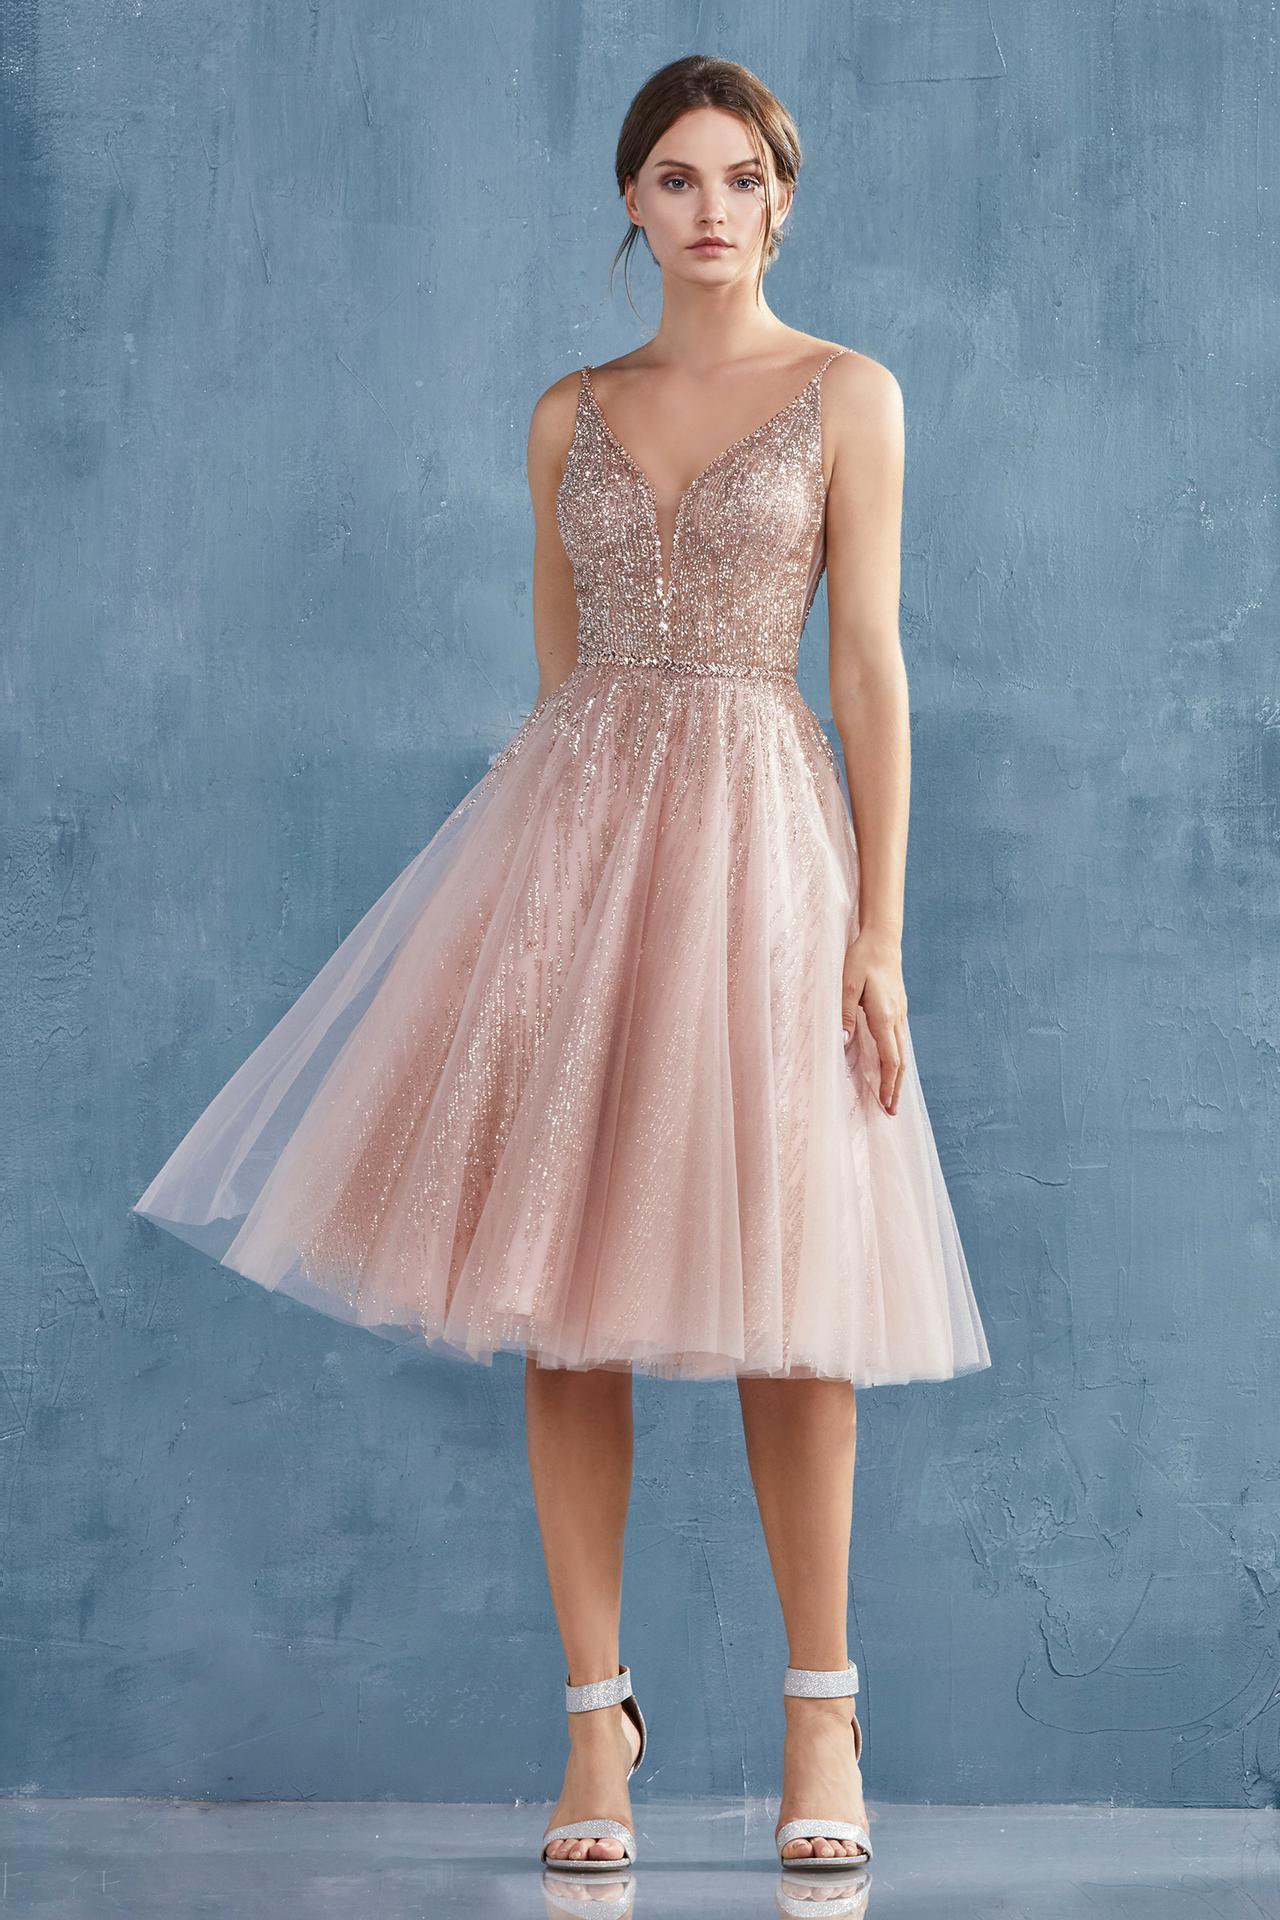 Nové spoločenské šaty :) - Obrázok č. 52